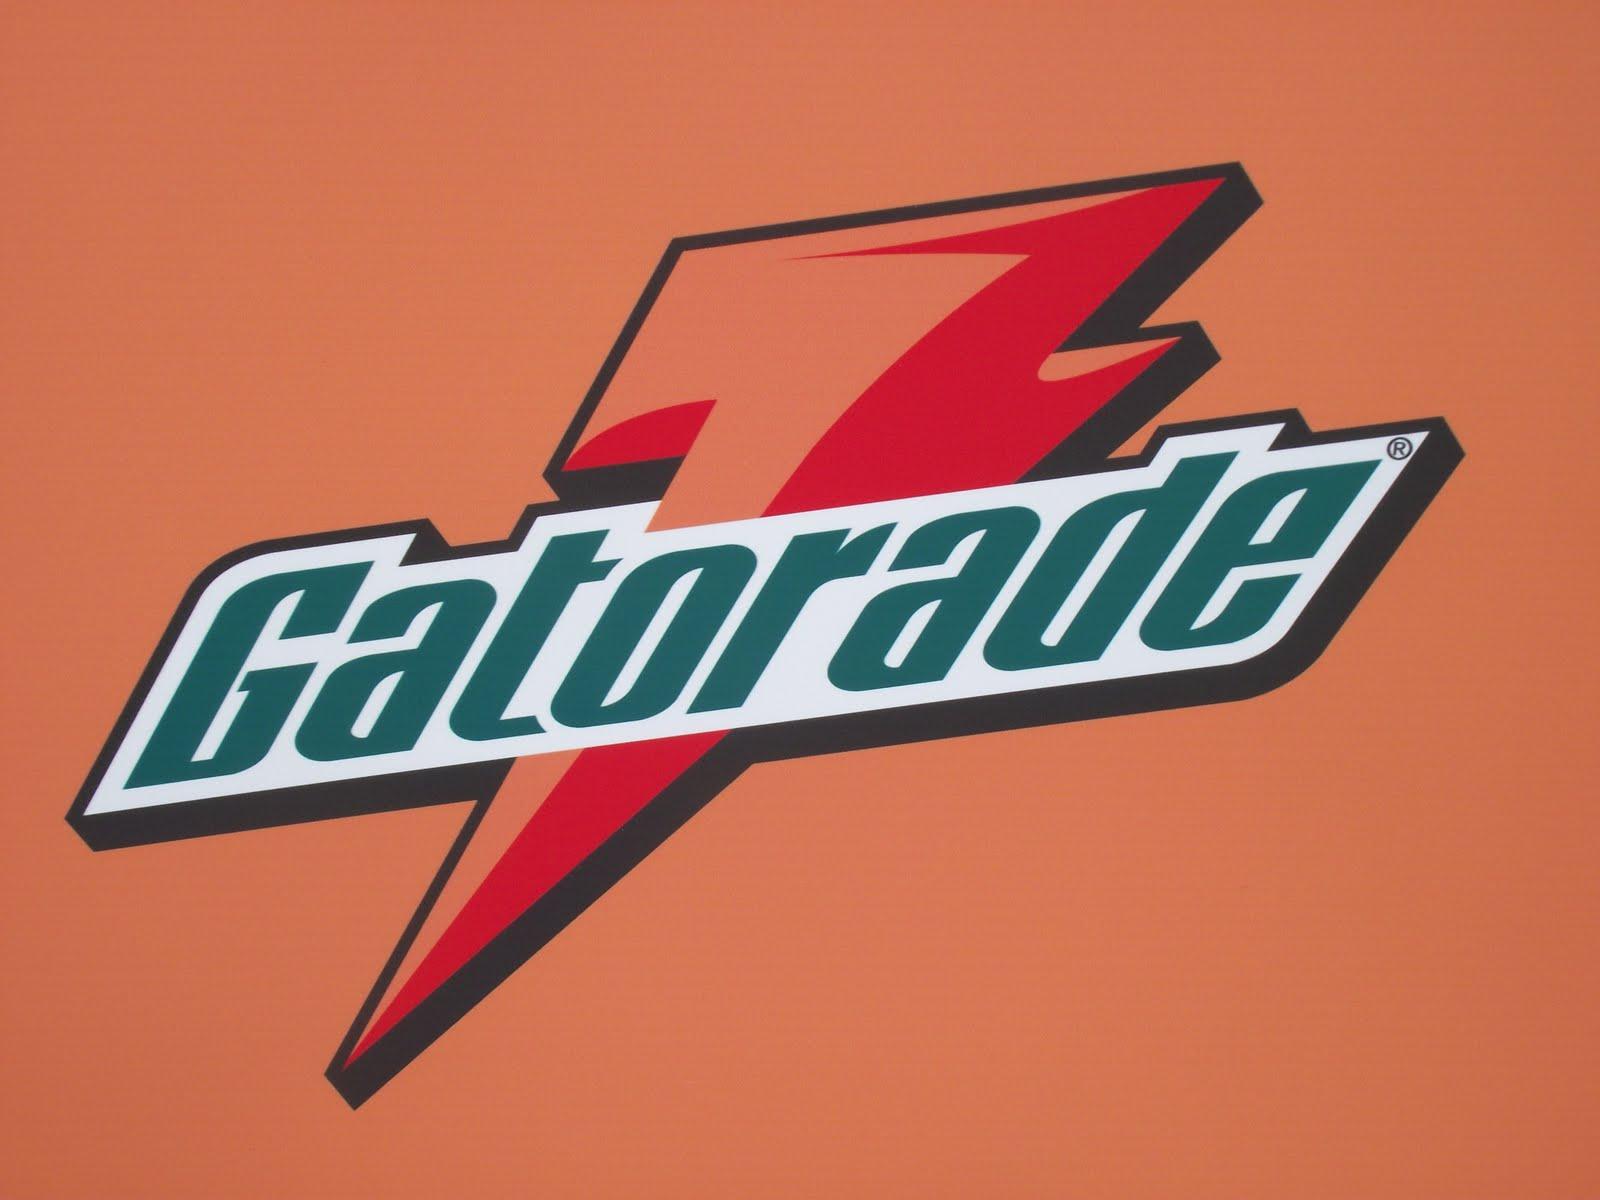 Gatorade Logo Wallpaper 31983 1600x1200px 1600x1200